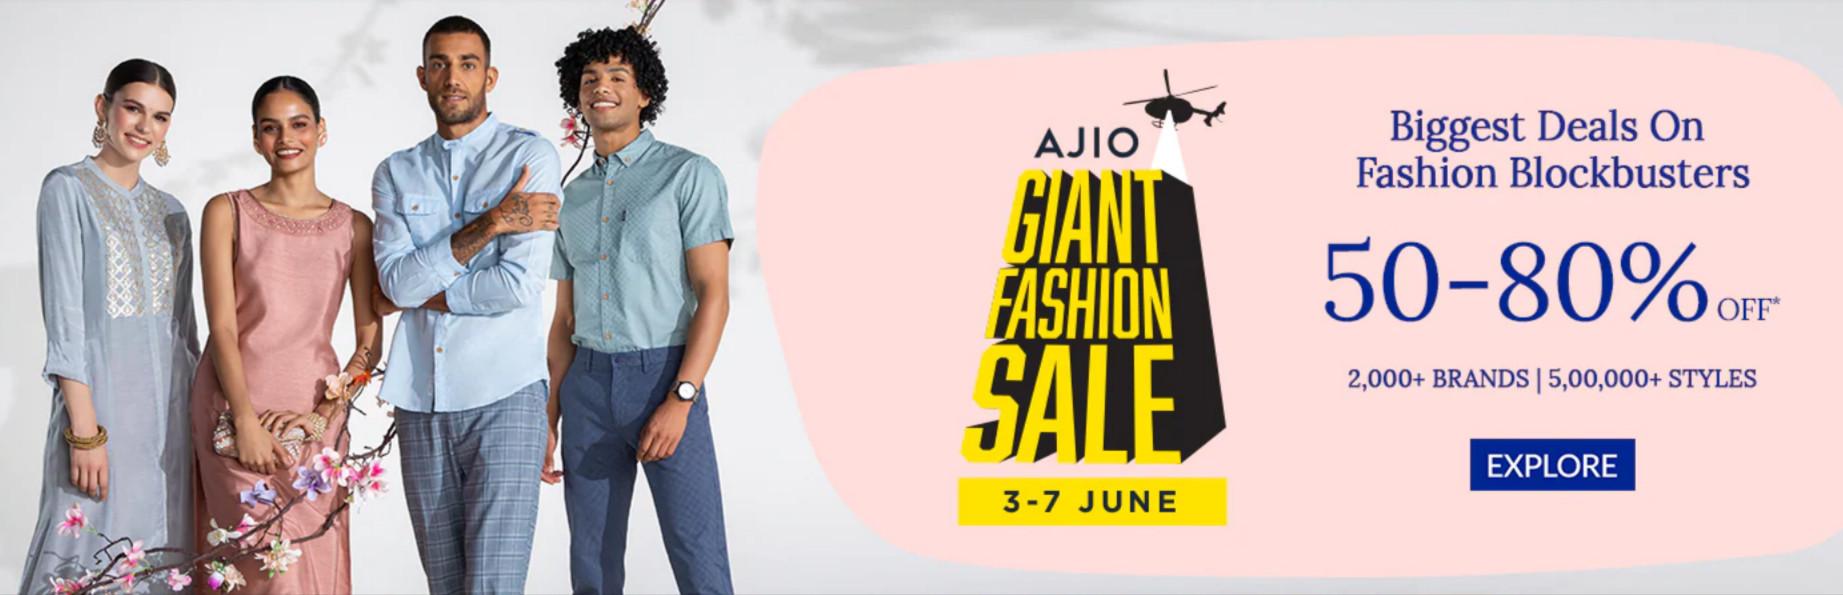 Ajio Giant Fashion Sale 2021